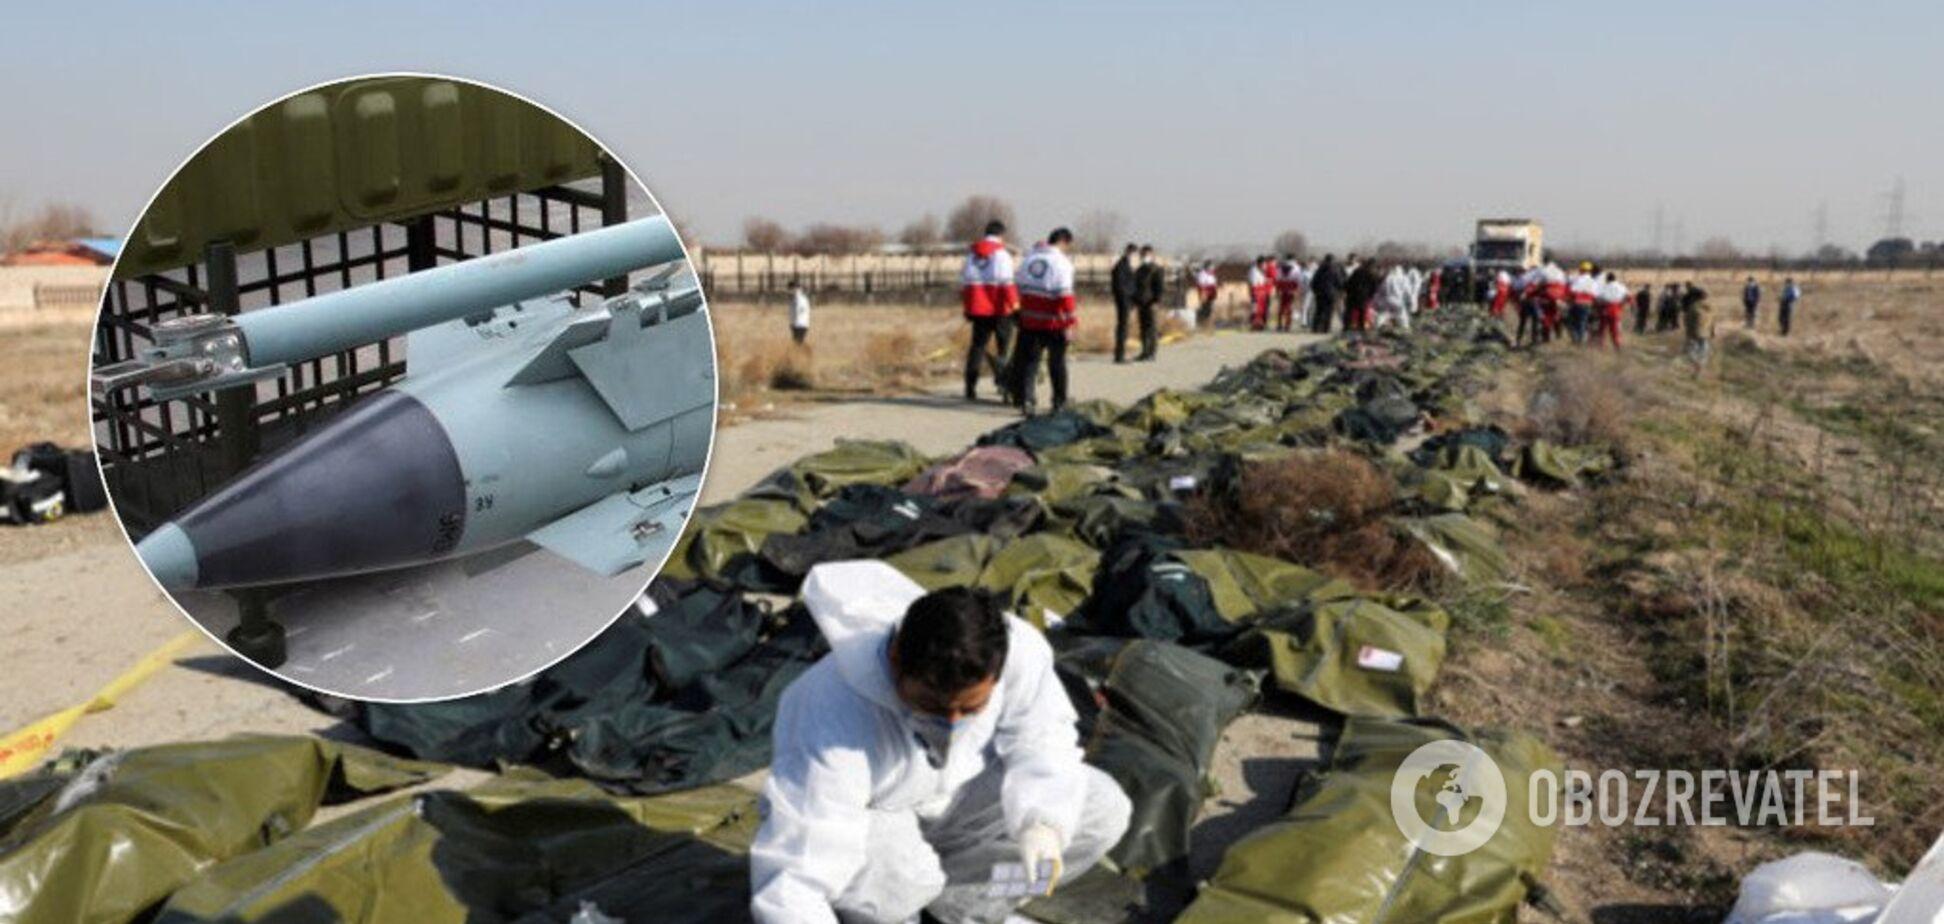 Узнали за день до: власти Ирана сделали признание о крушении самолета МАУ